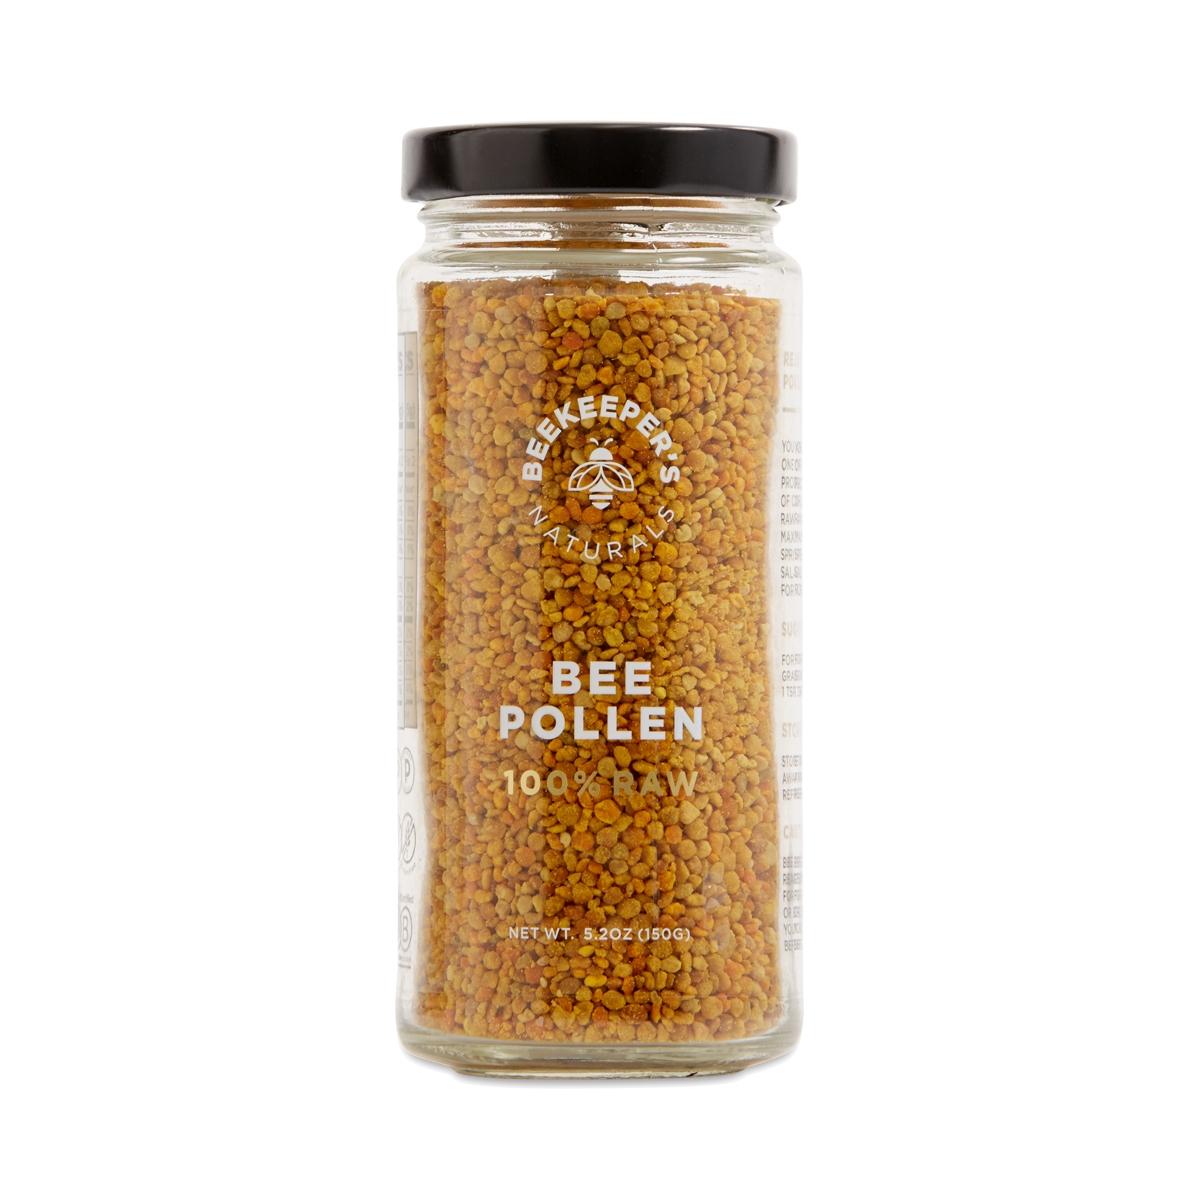 Better Smoothie with Beekeeper's Naturals 100% Raw Bee Pollen 150g jar